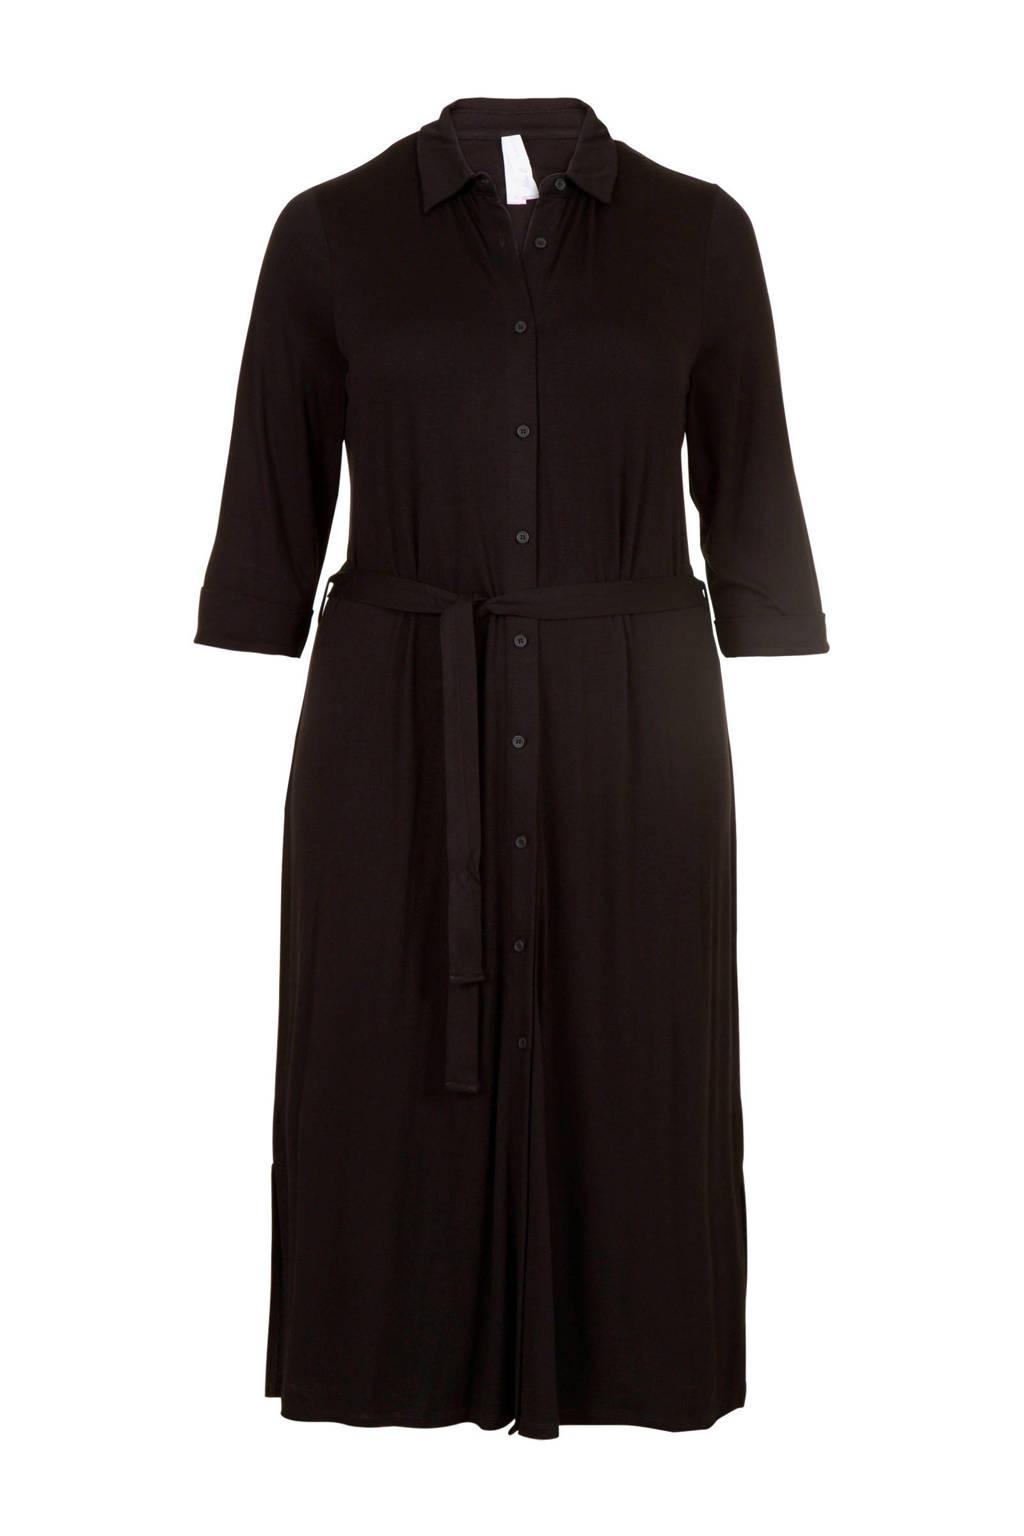 Miss Etam Plus blousejurk met ceintuur zwart, Zwart